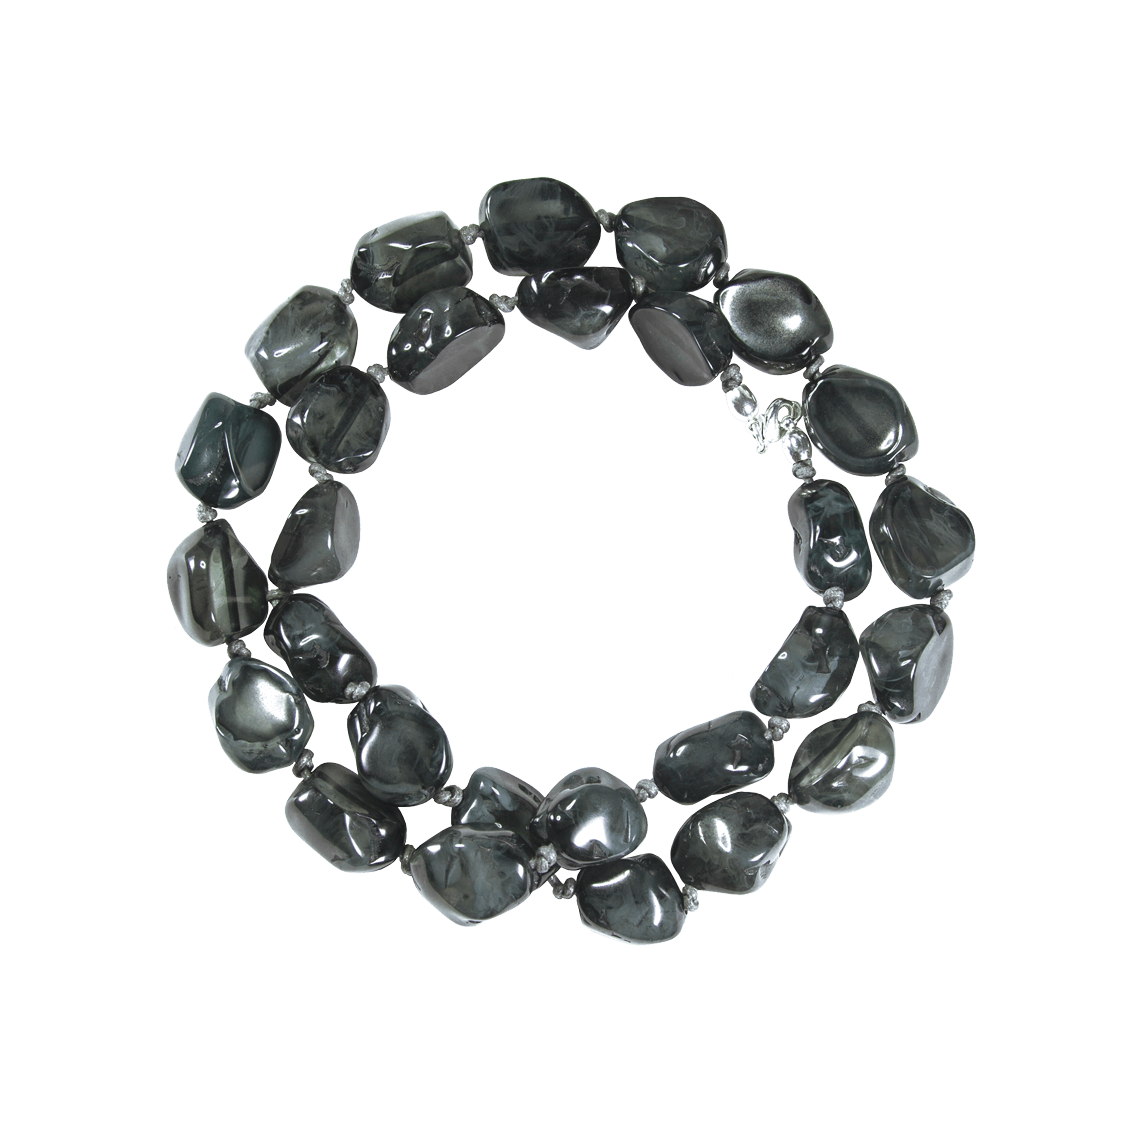 Collar de resina natural color gris antracita